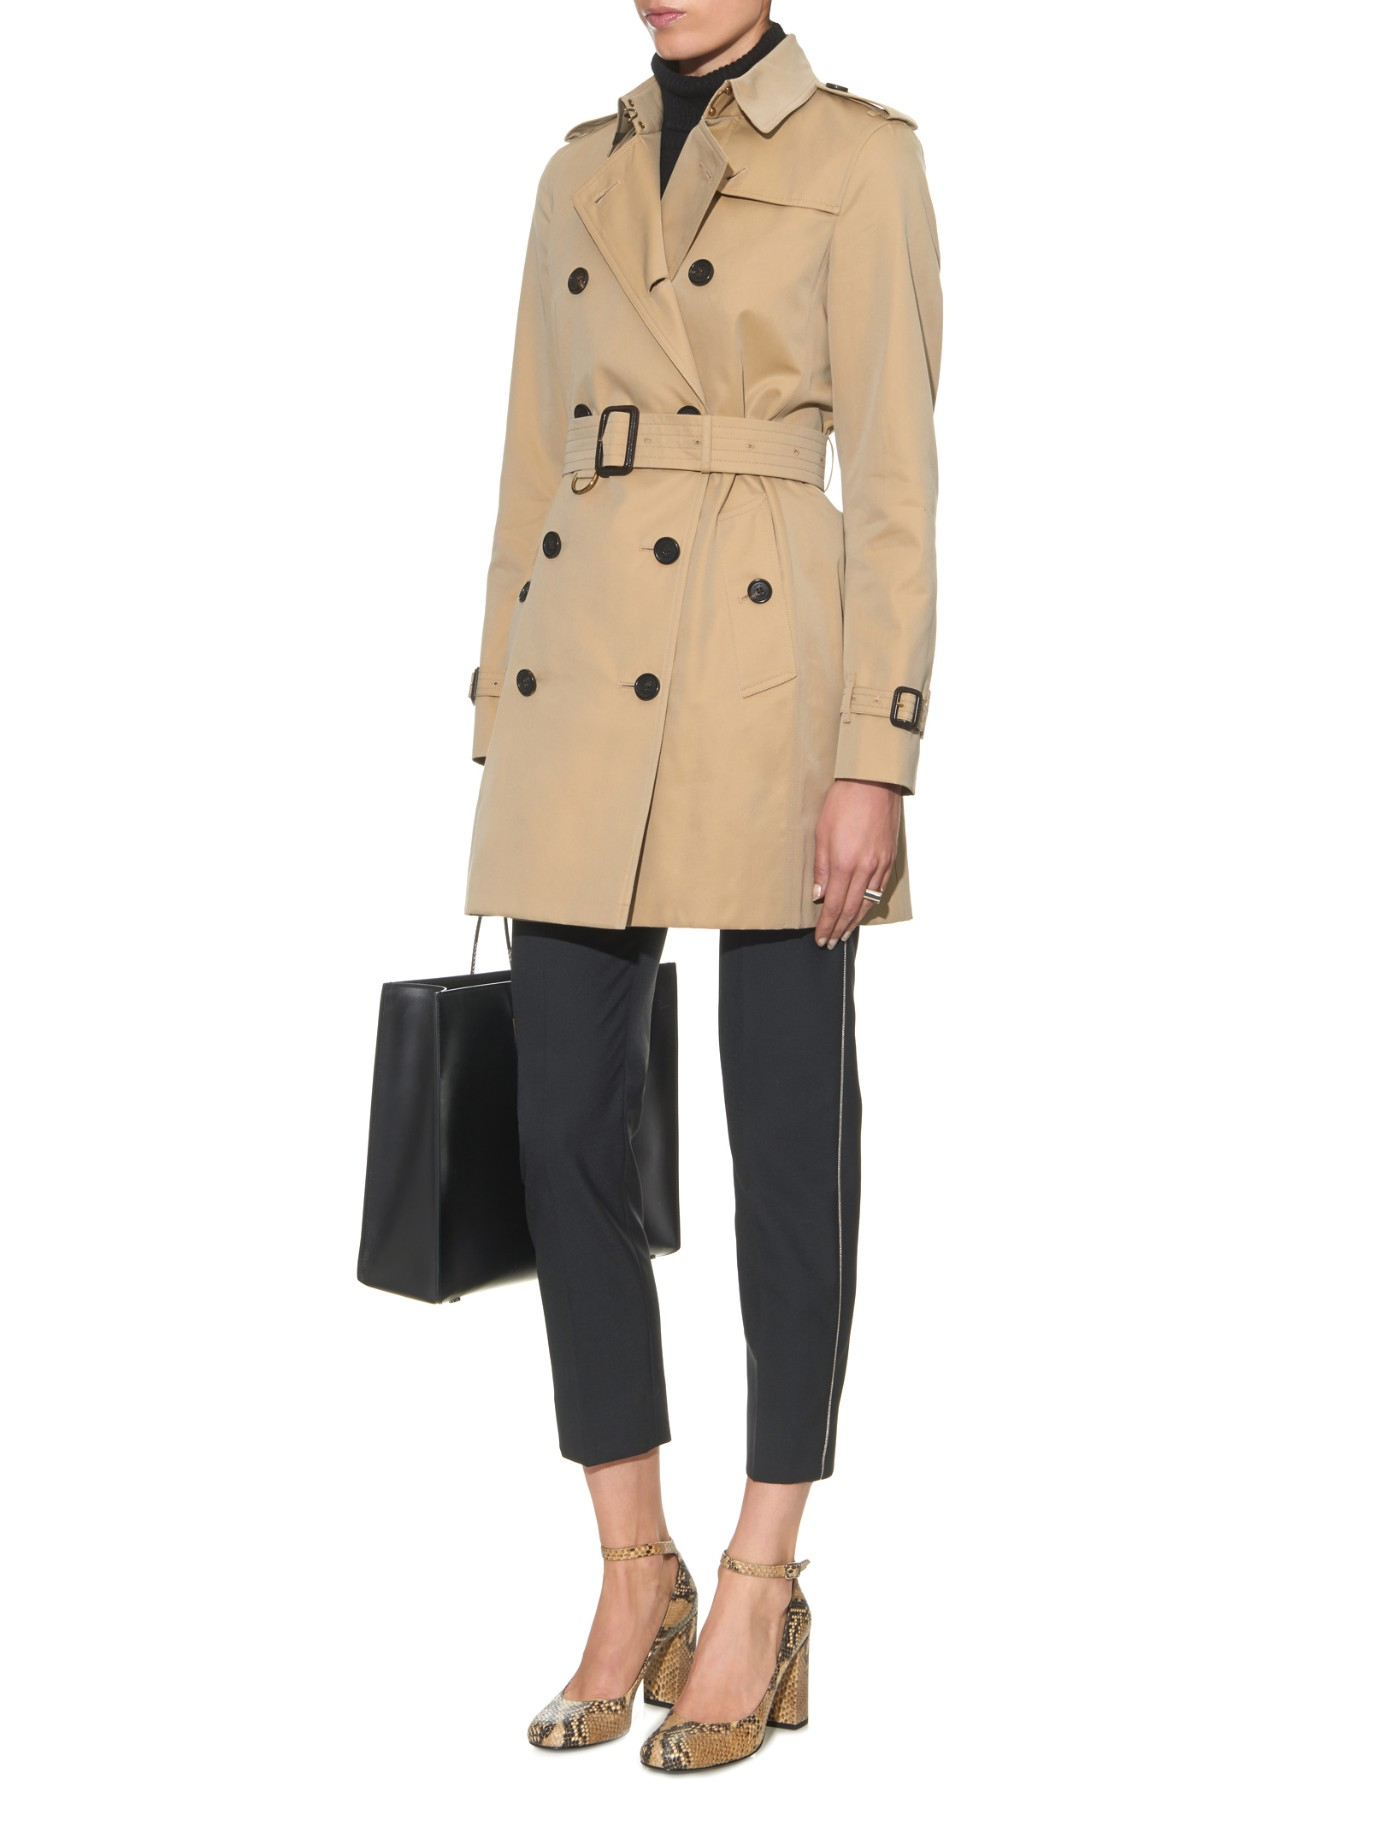 burberry kensington mid length gabardine trench coat in brown tan lyst. Black Bedroom Furniture Sets. Home Design Ideas